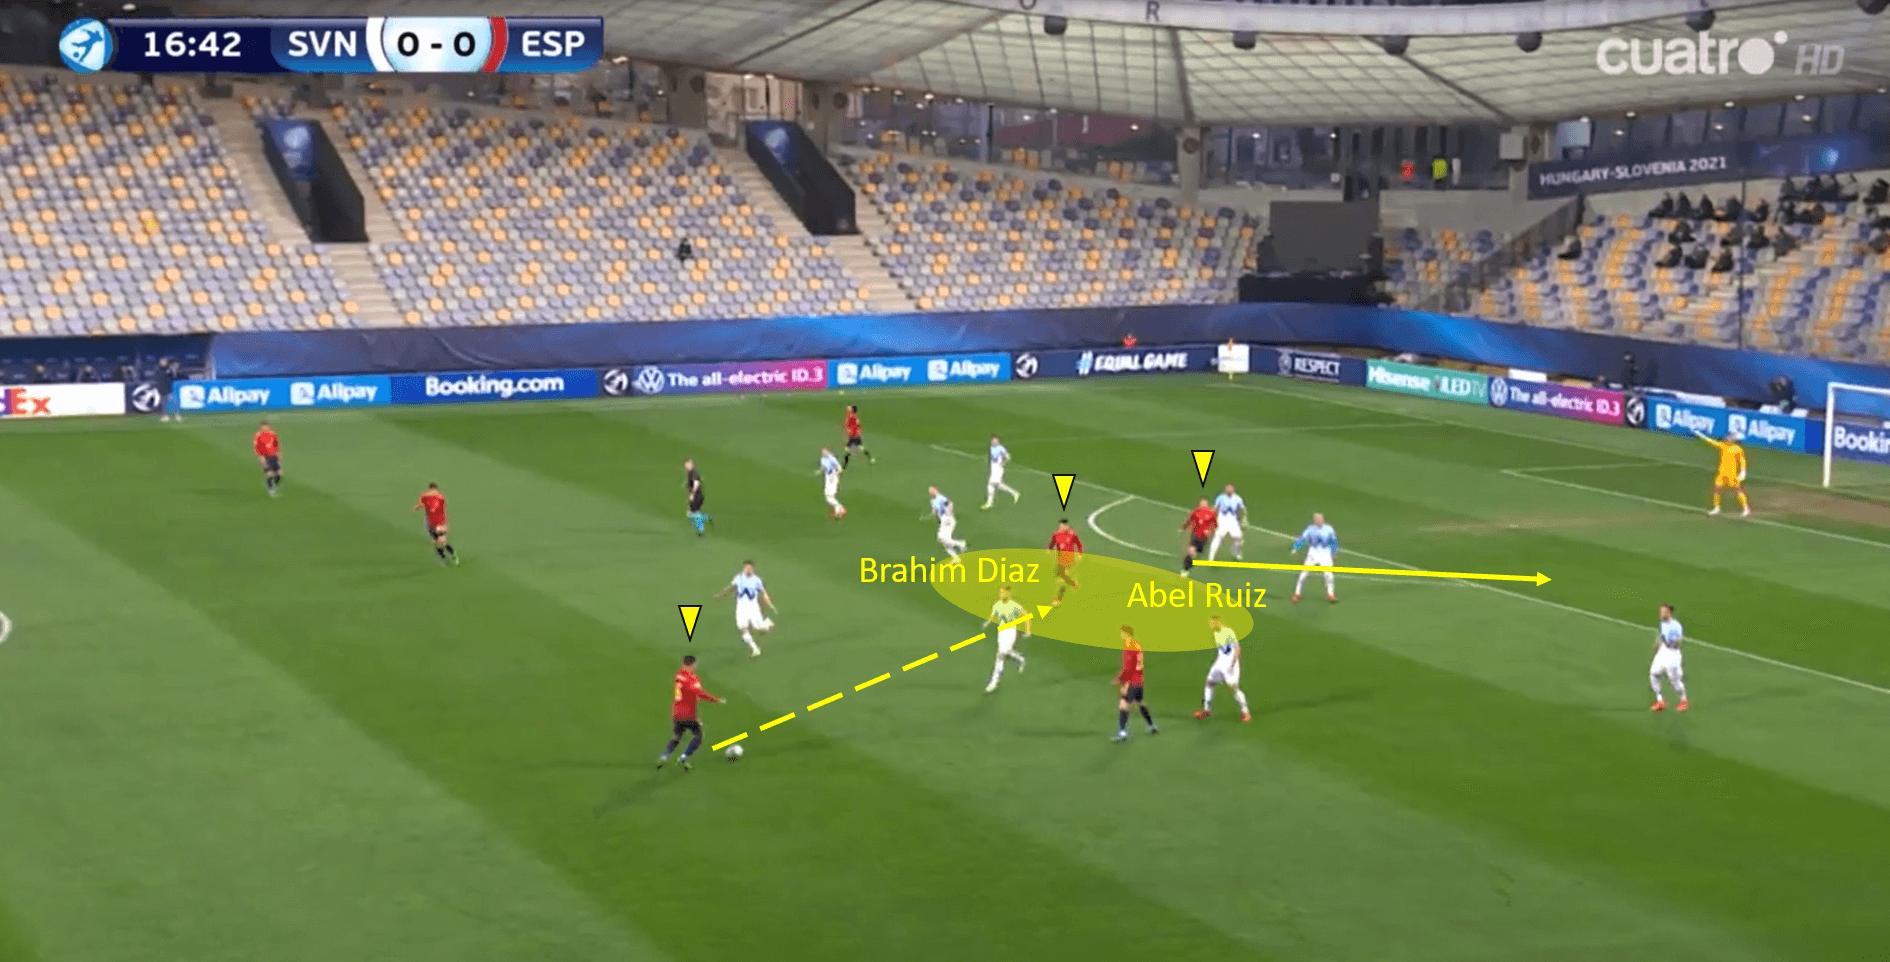 Spanish Superior: Villar and Diaz dazzle in Spain's dominant display tactical analysis tactics